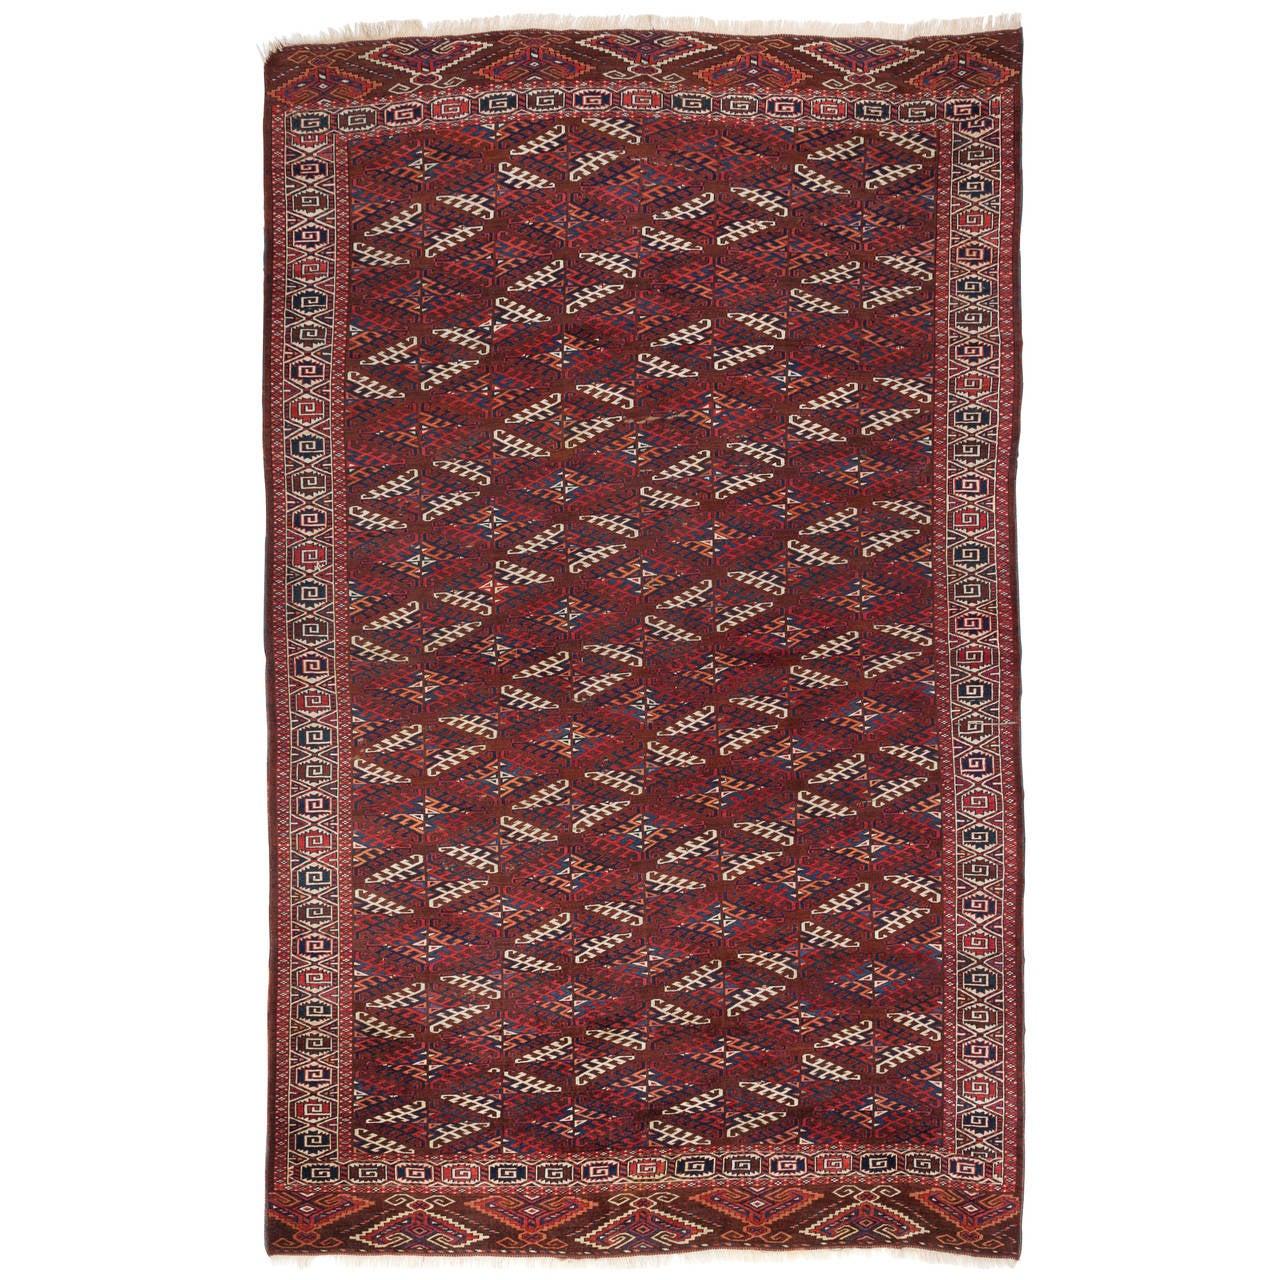 Antique Turkoman Yomut Main Carpet 19th Century For Sale